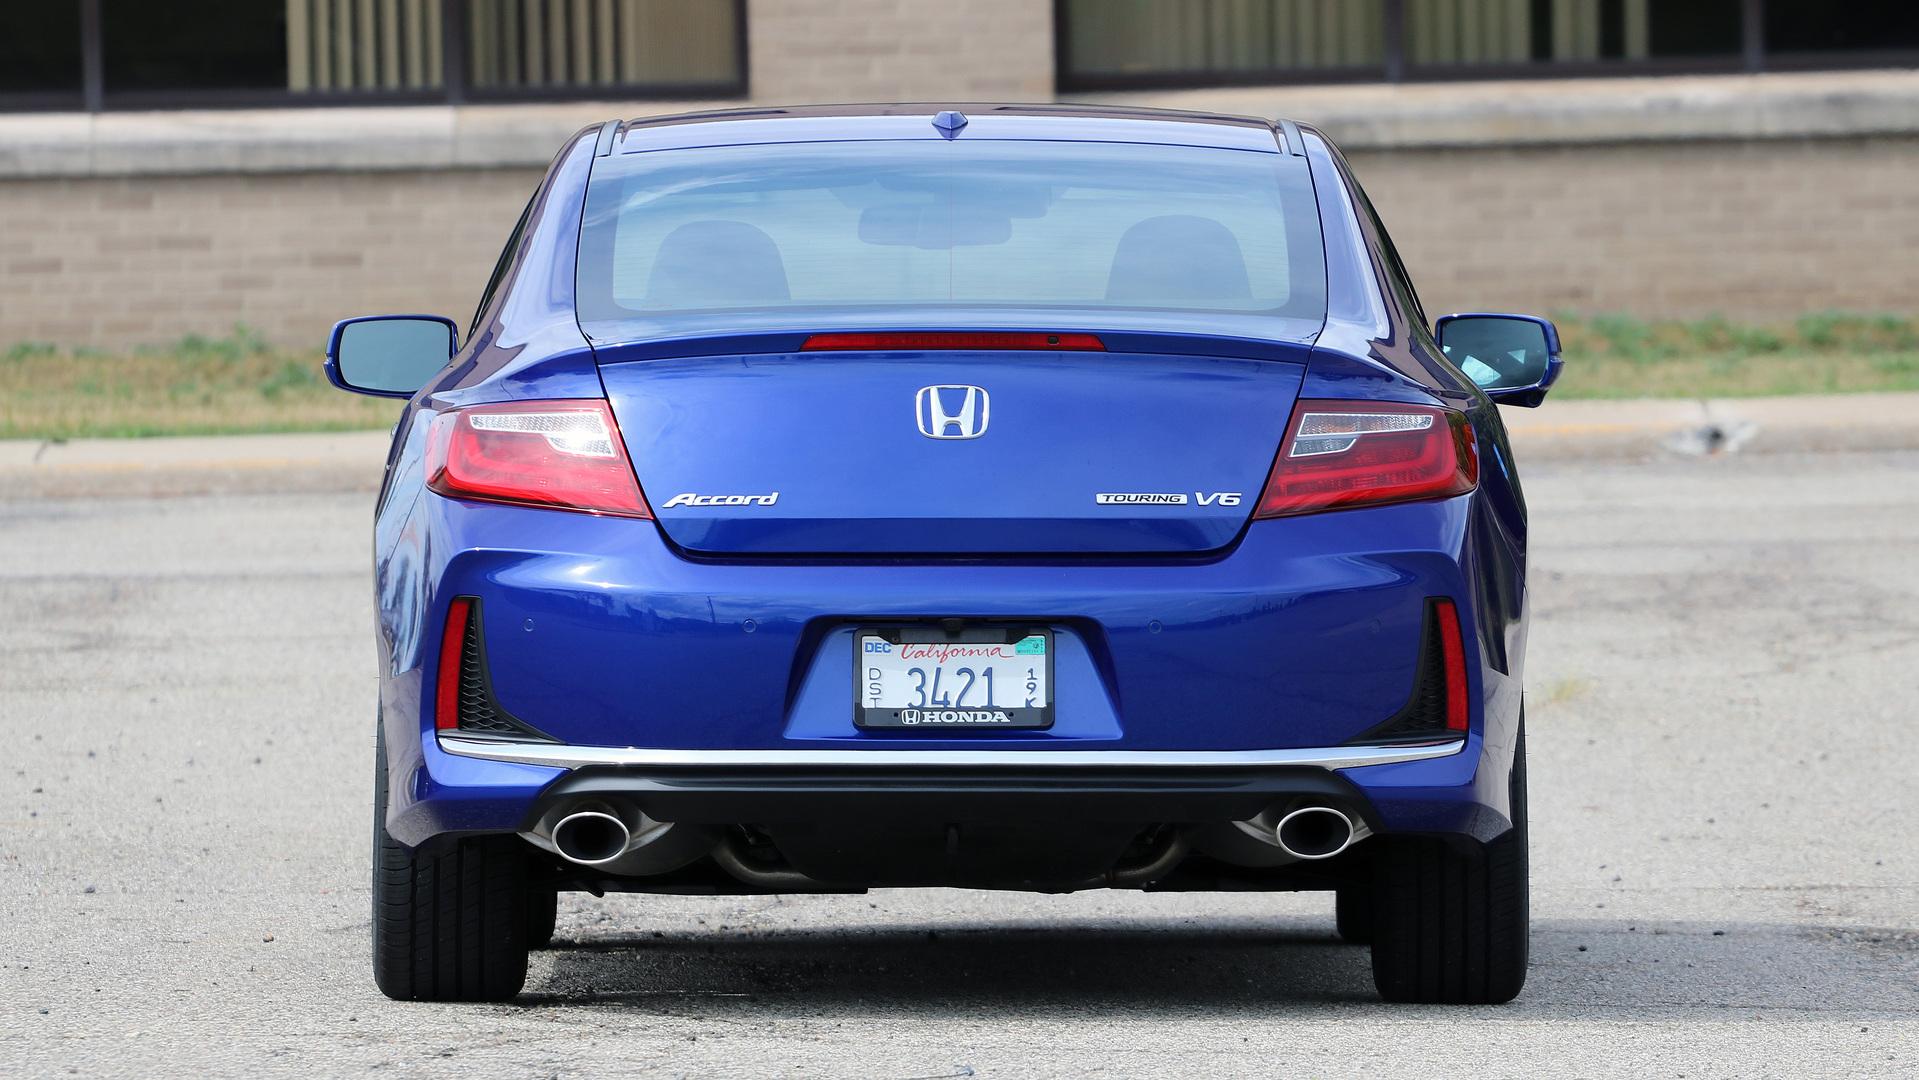 Review 2017 Honda Accord Coupe V6